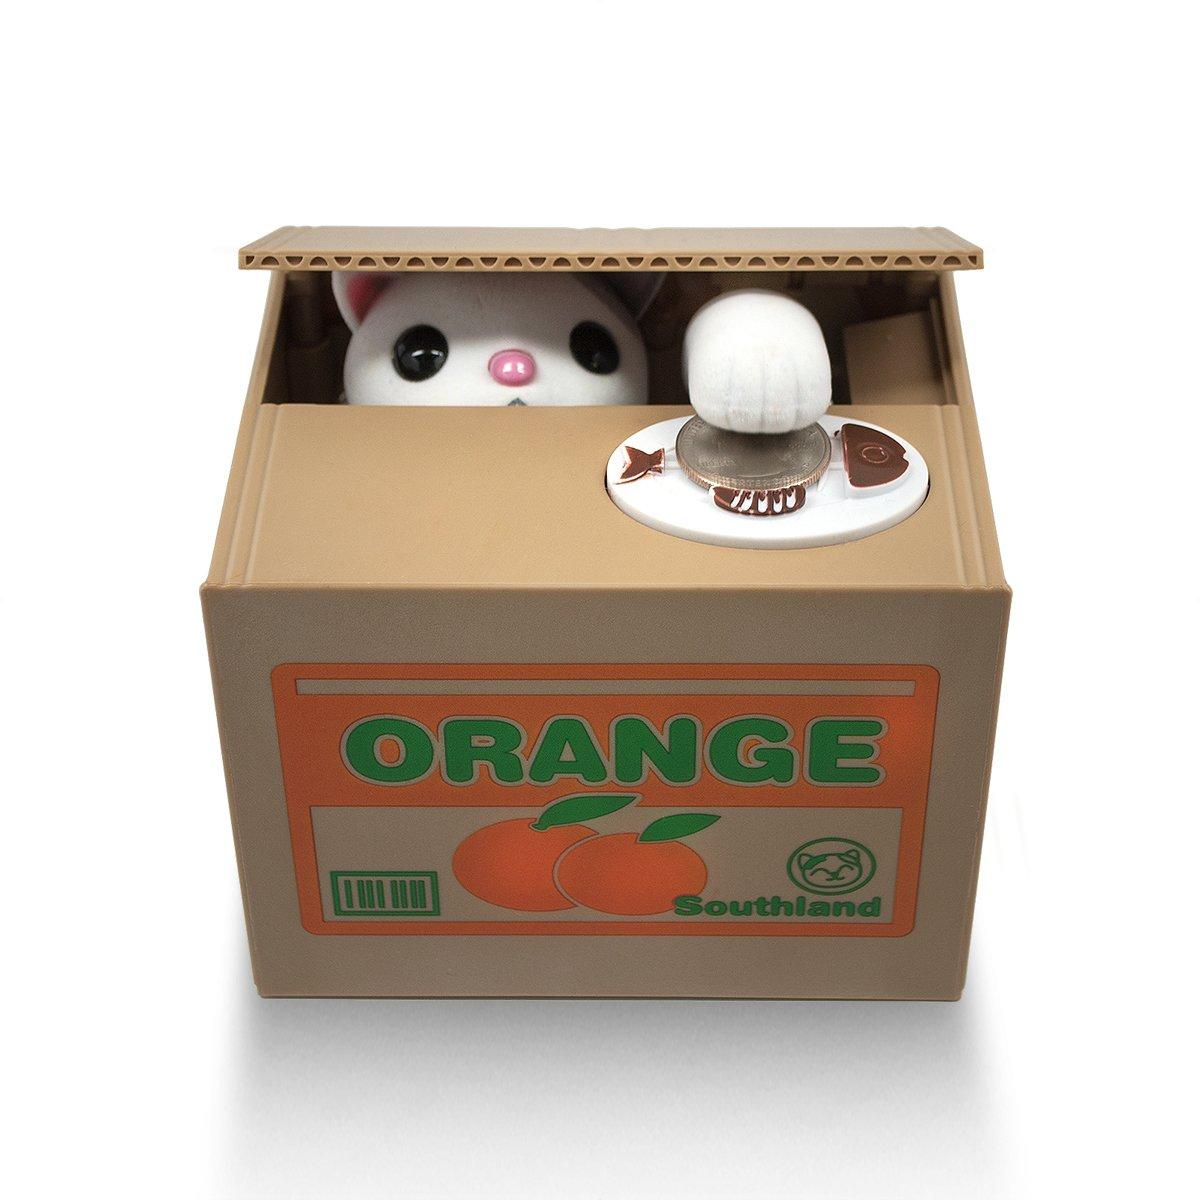 Matney Stealing Coin Cat Box- Piggy Bank - White Kitty - English Speaking